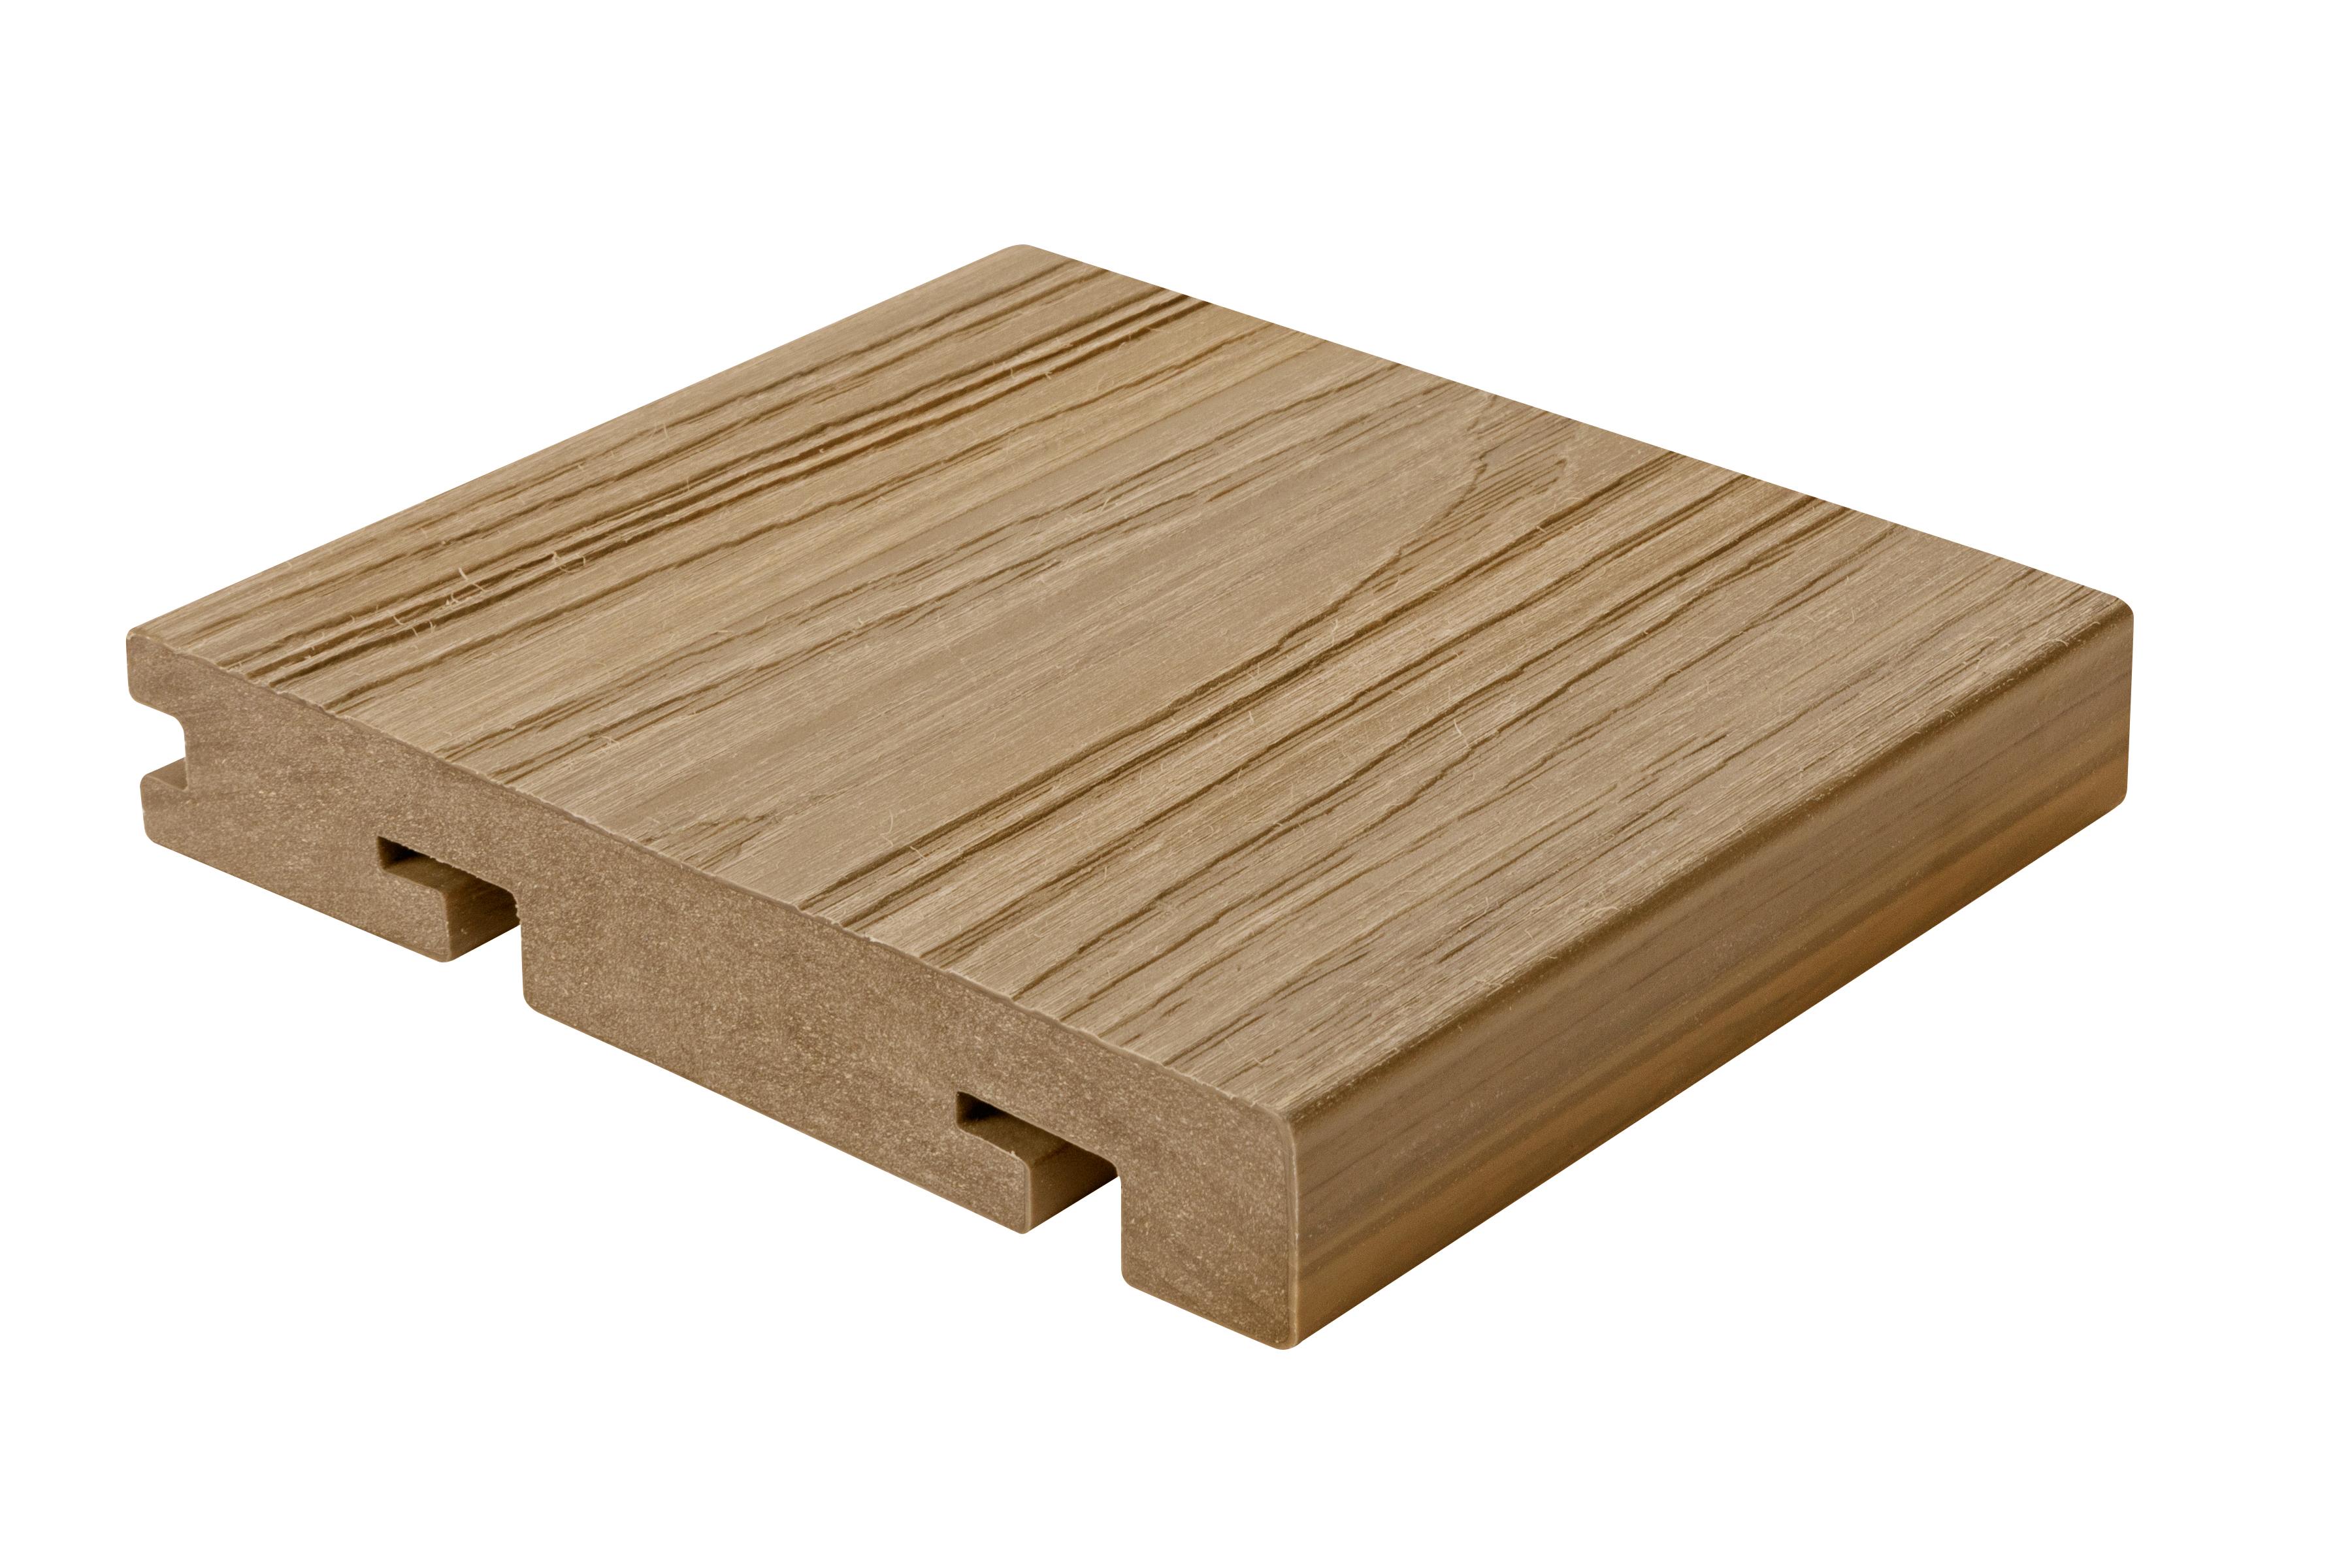 HD Deck Dual Bullnose Natural Oak 22.5xx x 150mm x 3600mm